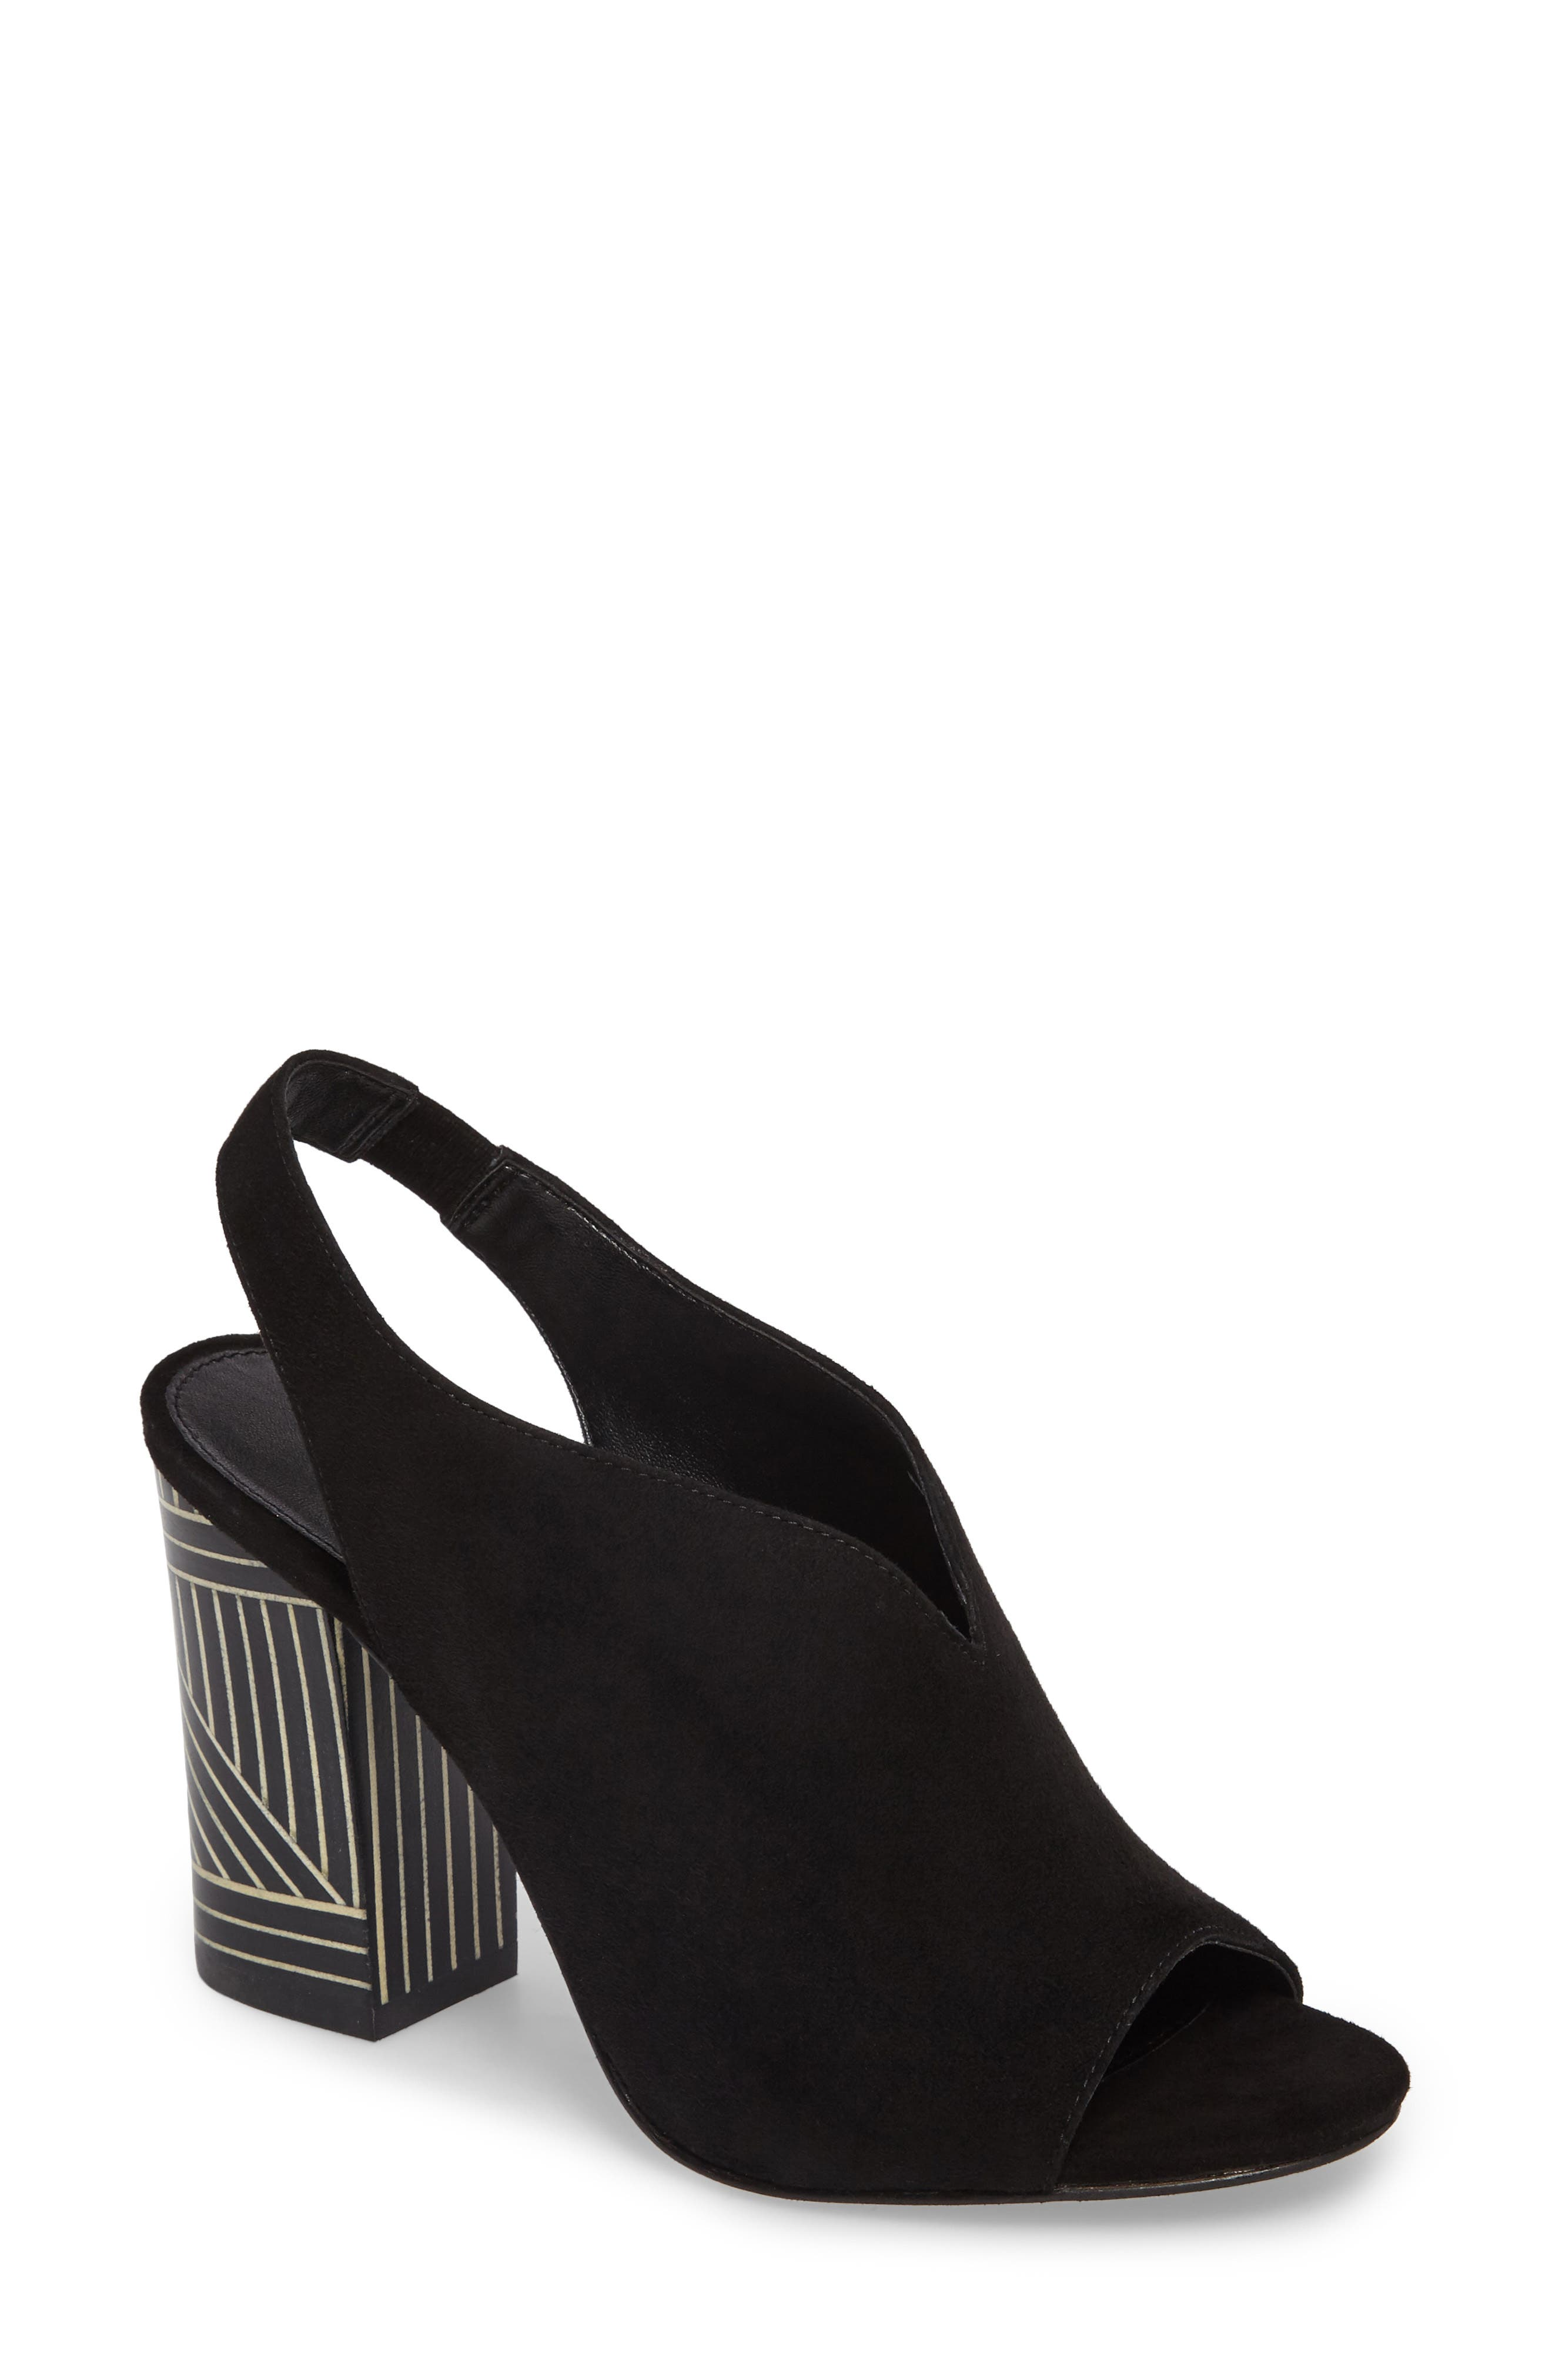 Madra Slingback Sandal,                         Main,                         color, 001